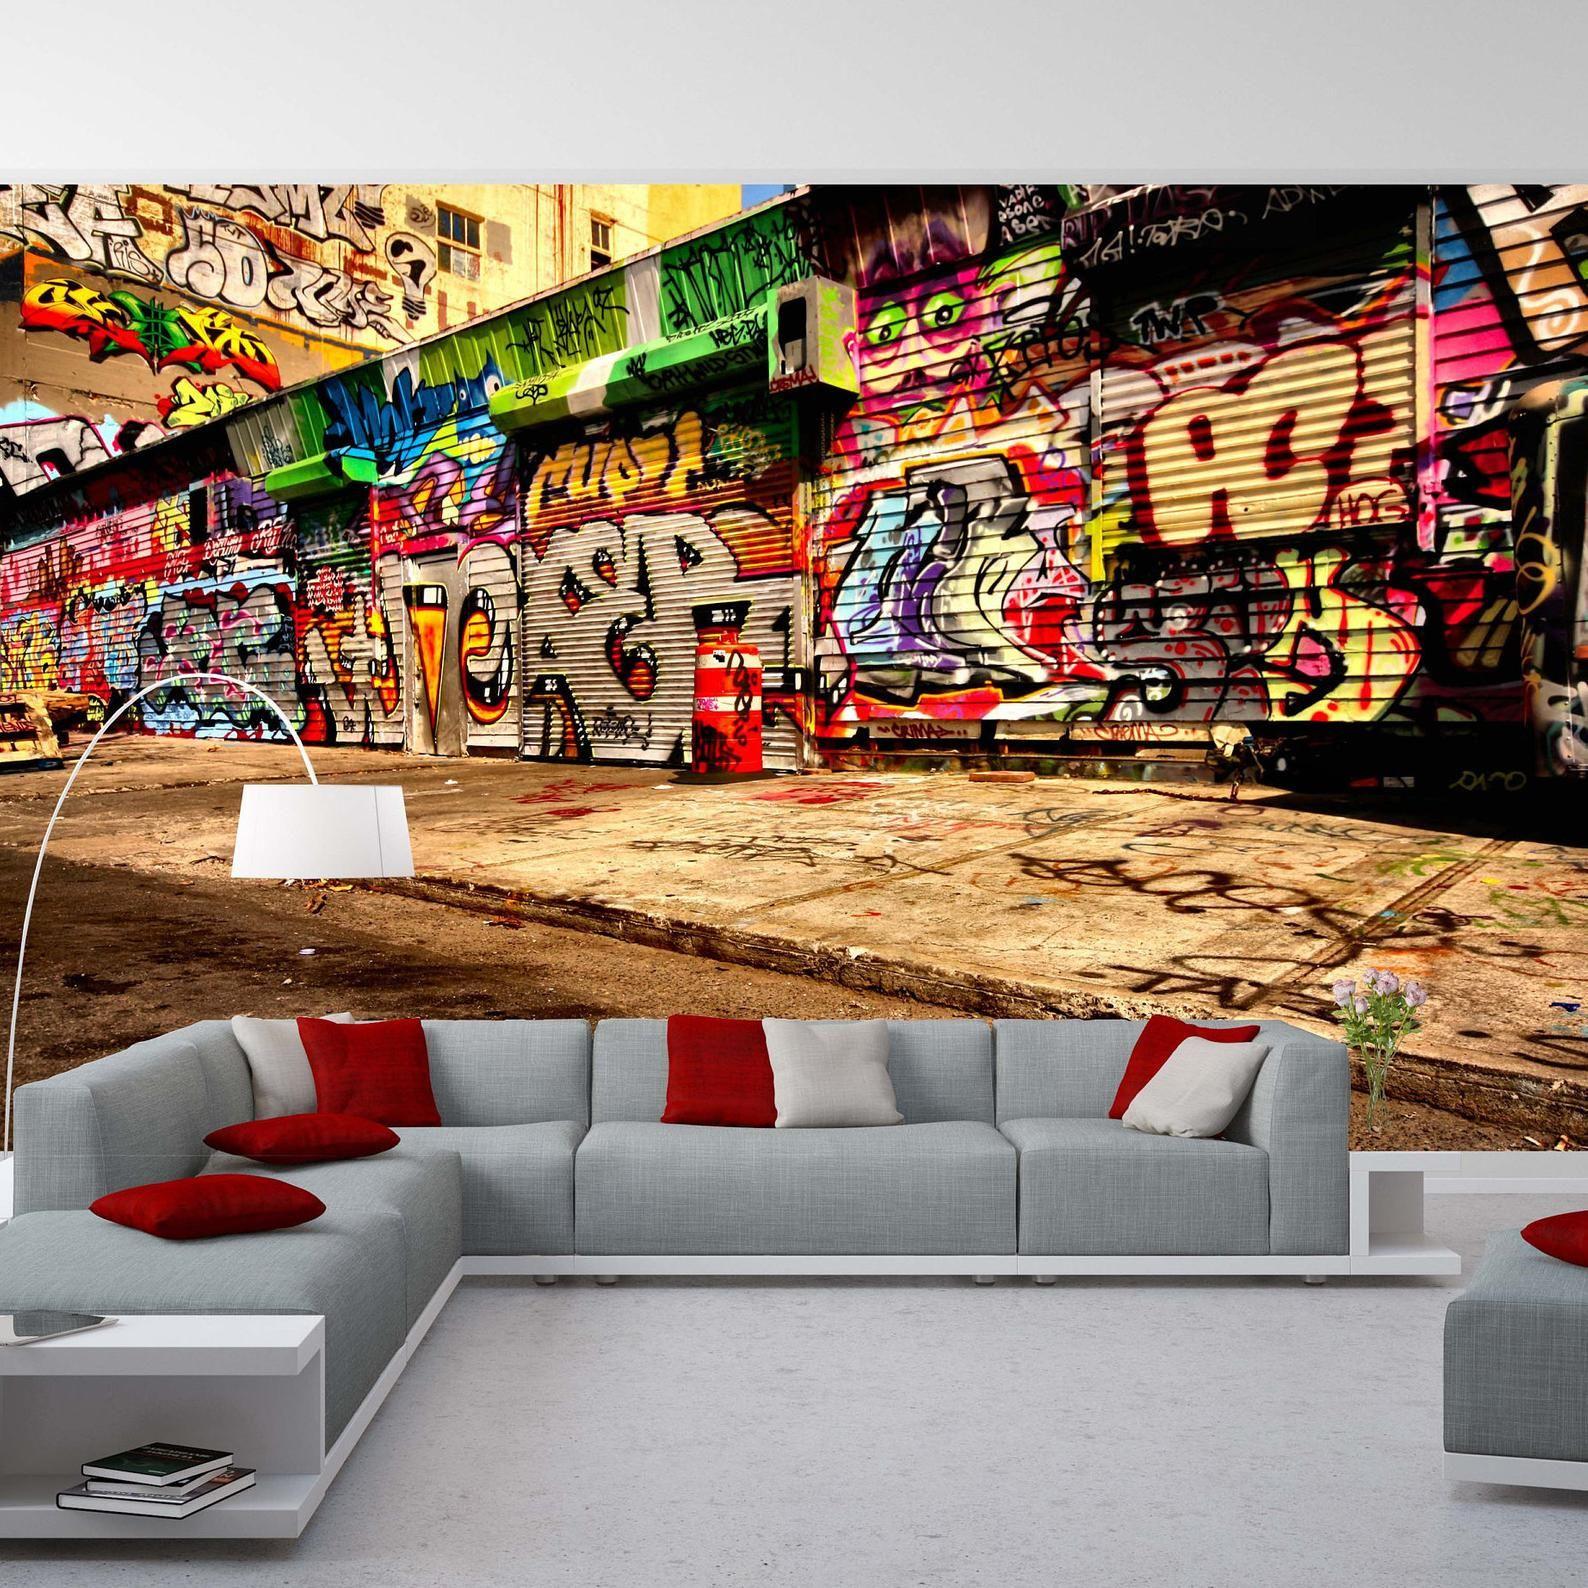 Removable Wallpaper Mural Peel & Stick Graffiti Self ...